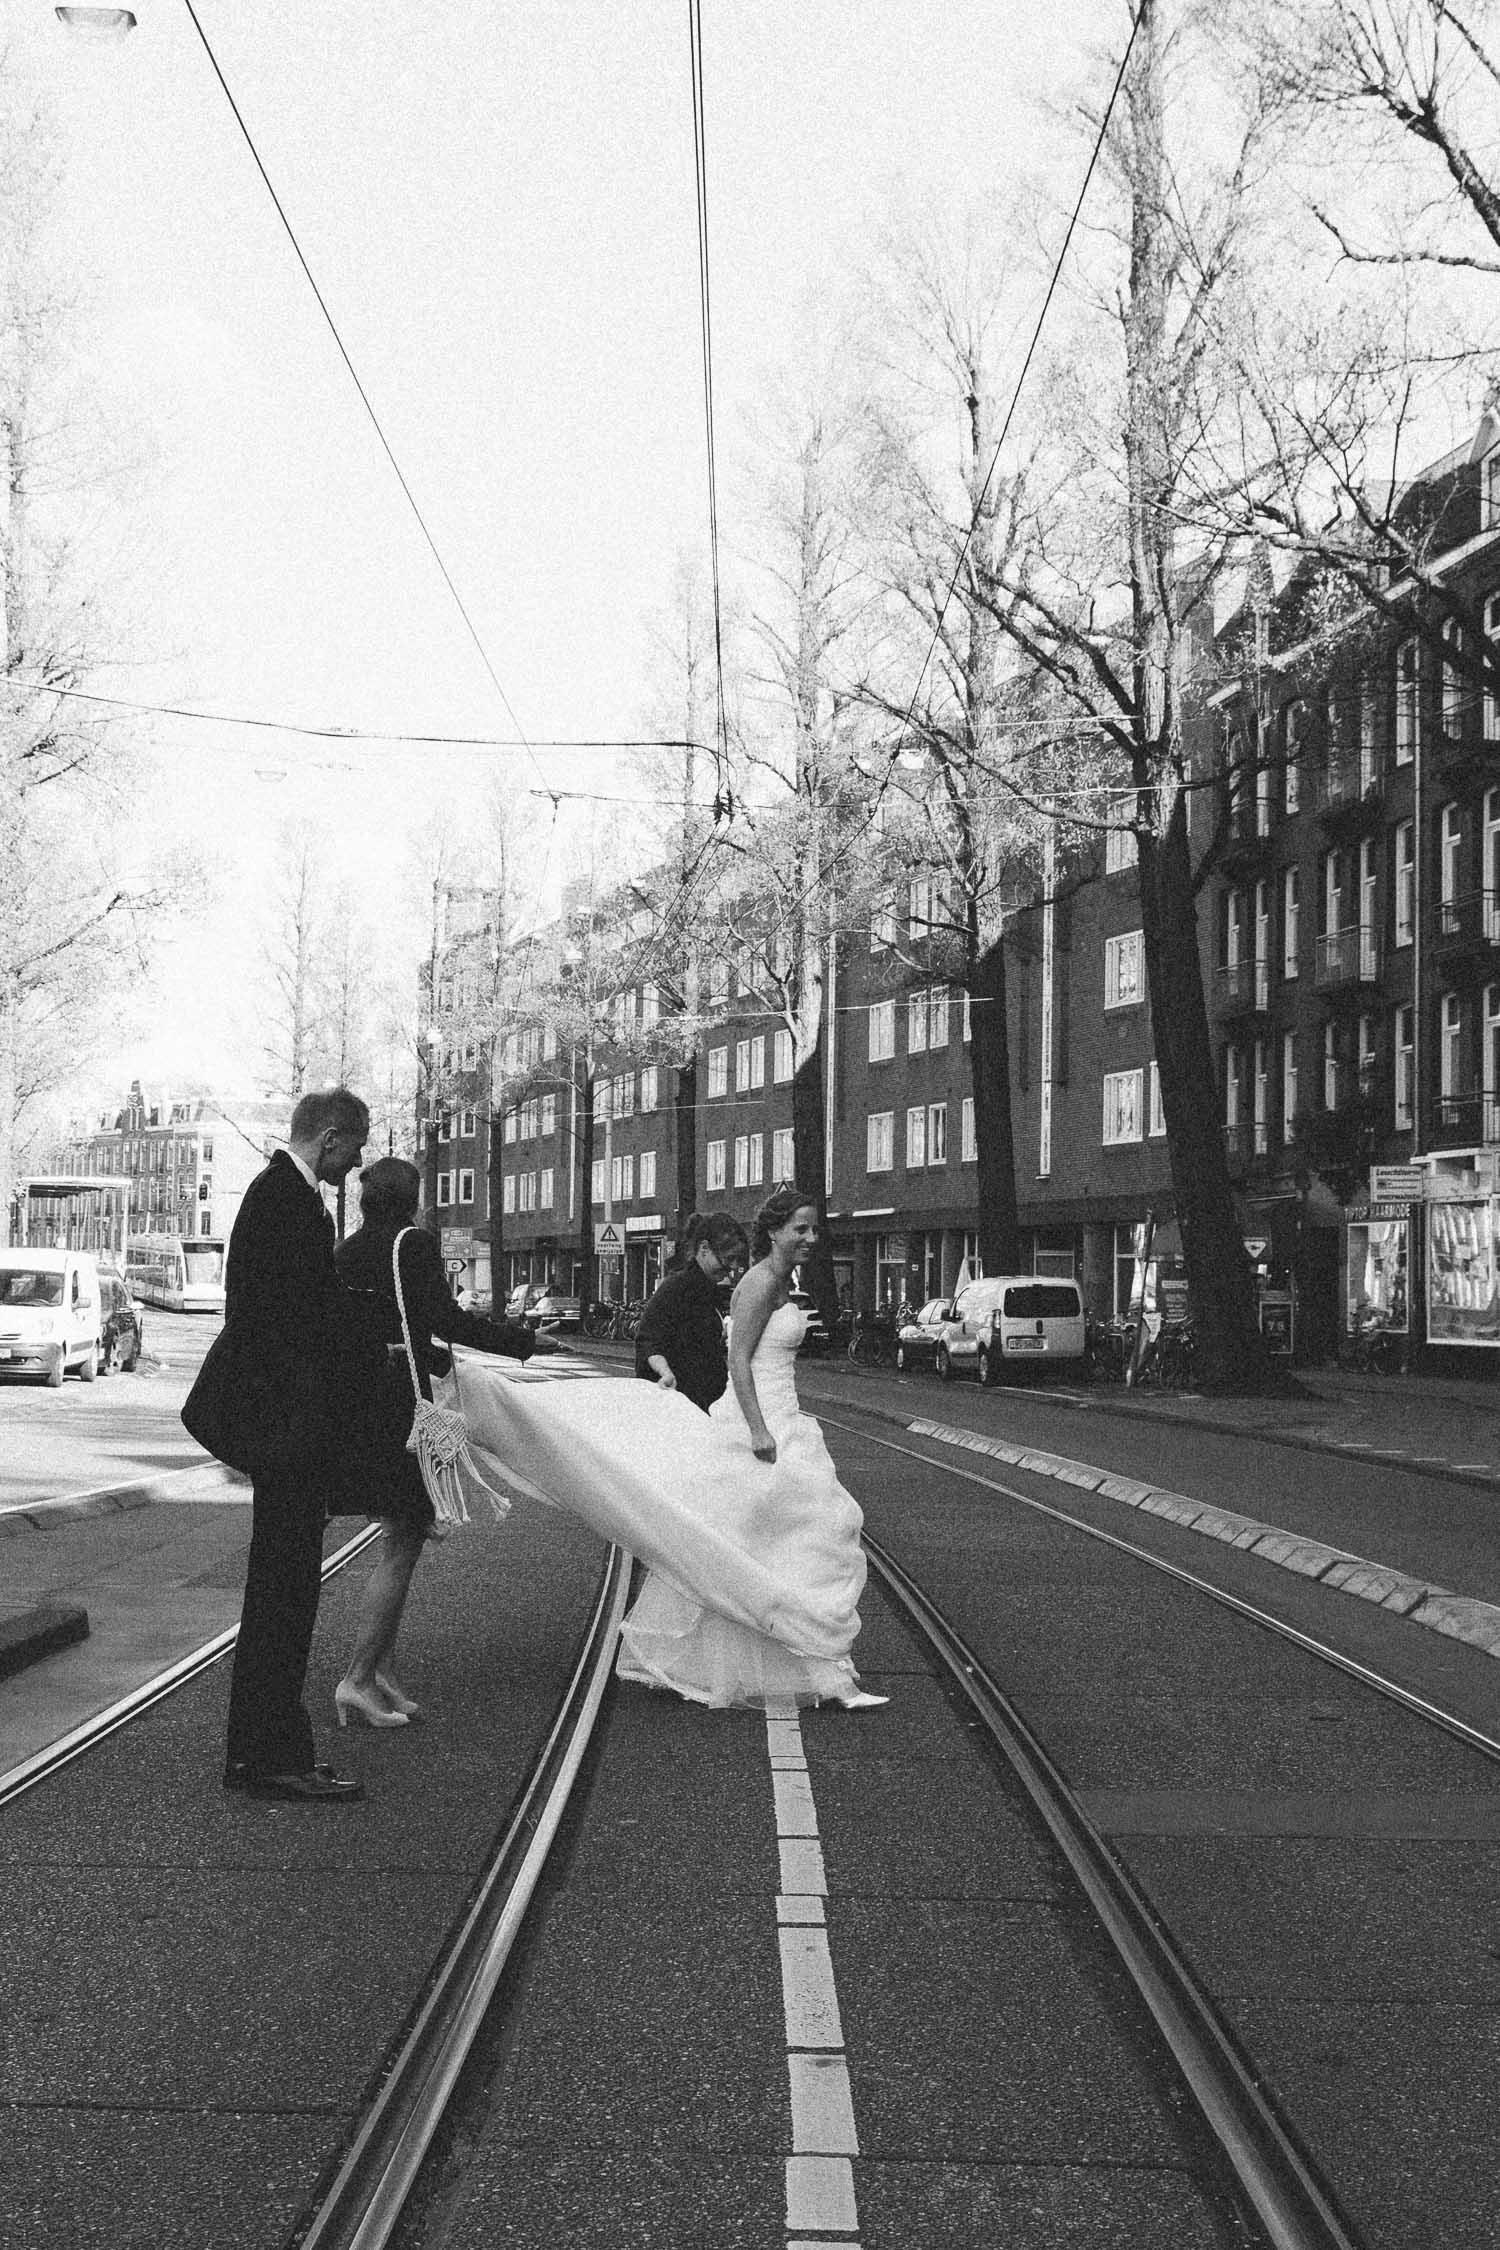 Wedding-huwelijk-trouwen-bruiloft-photography-fotografie-fotograaf-photographer-Rijksmuseum-College-Hotel-On-a-hazy-morning-Amsterdam-The-Netherlands-67.jpg